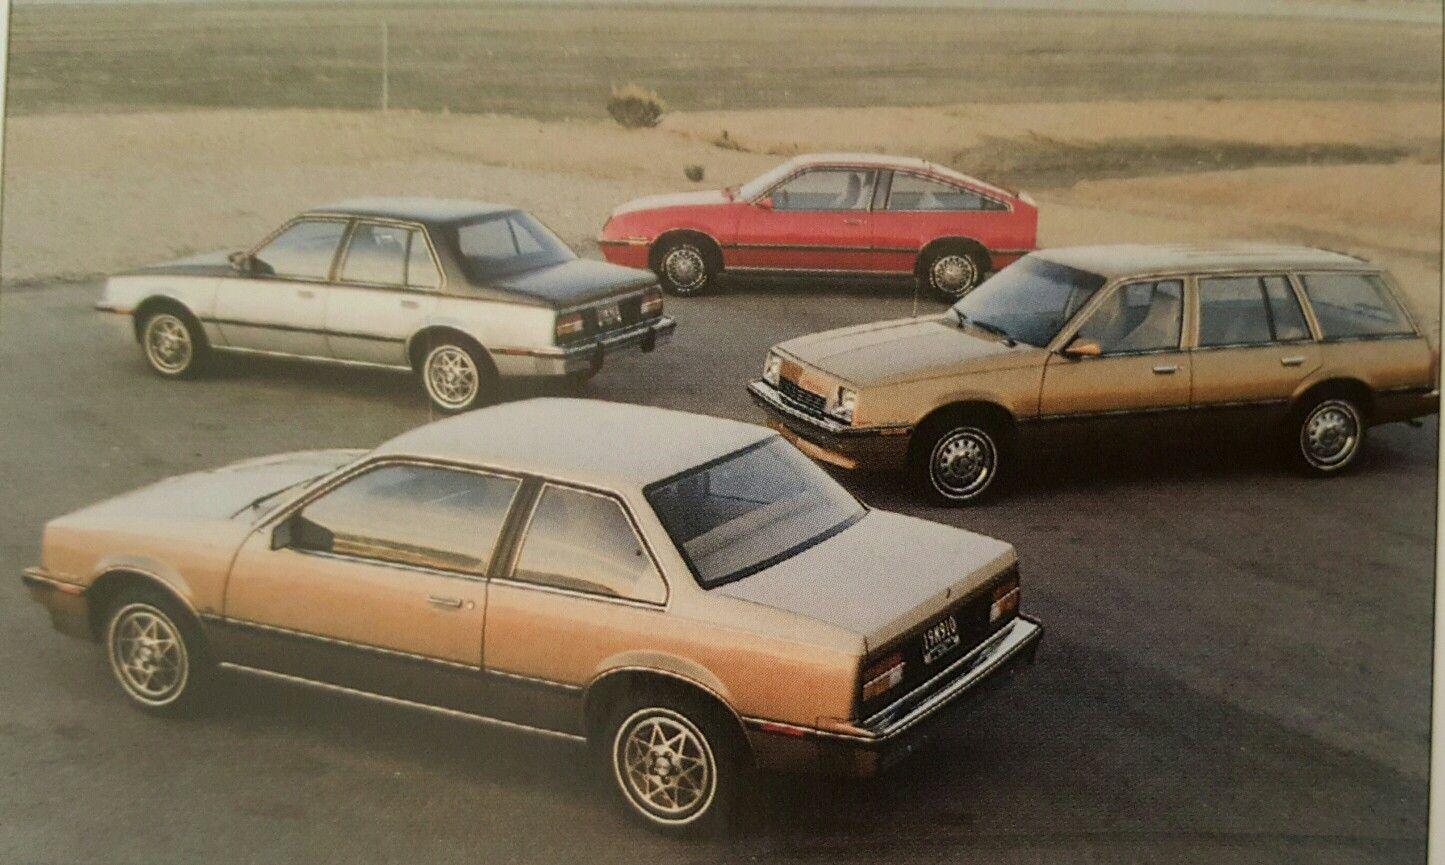 Cavalier 1982 chevrolet cavalier : 1982 Chevrolet Cavalier | Cars and Trucks Various Makes and Models ...